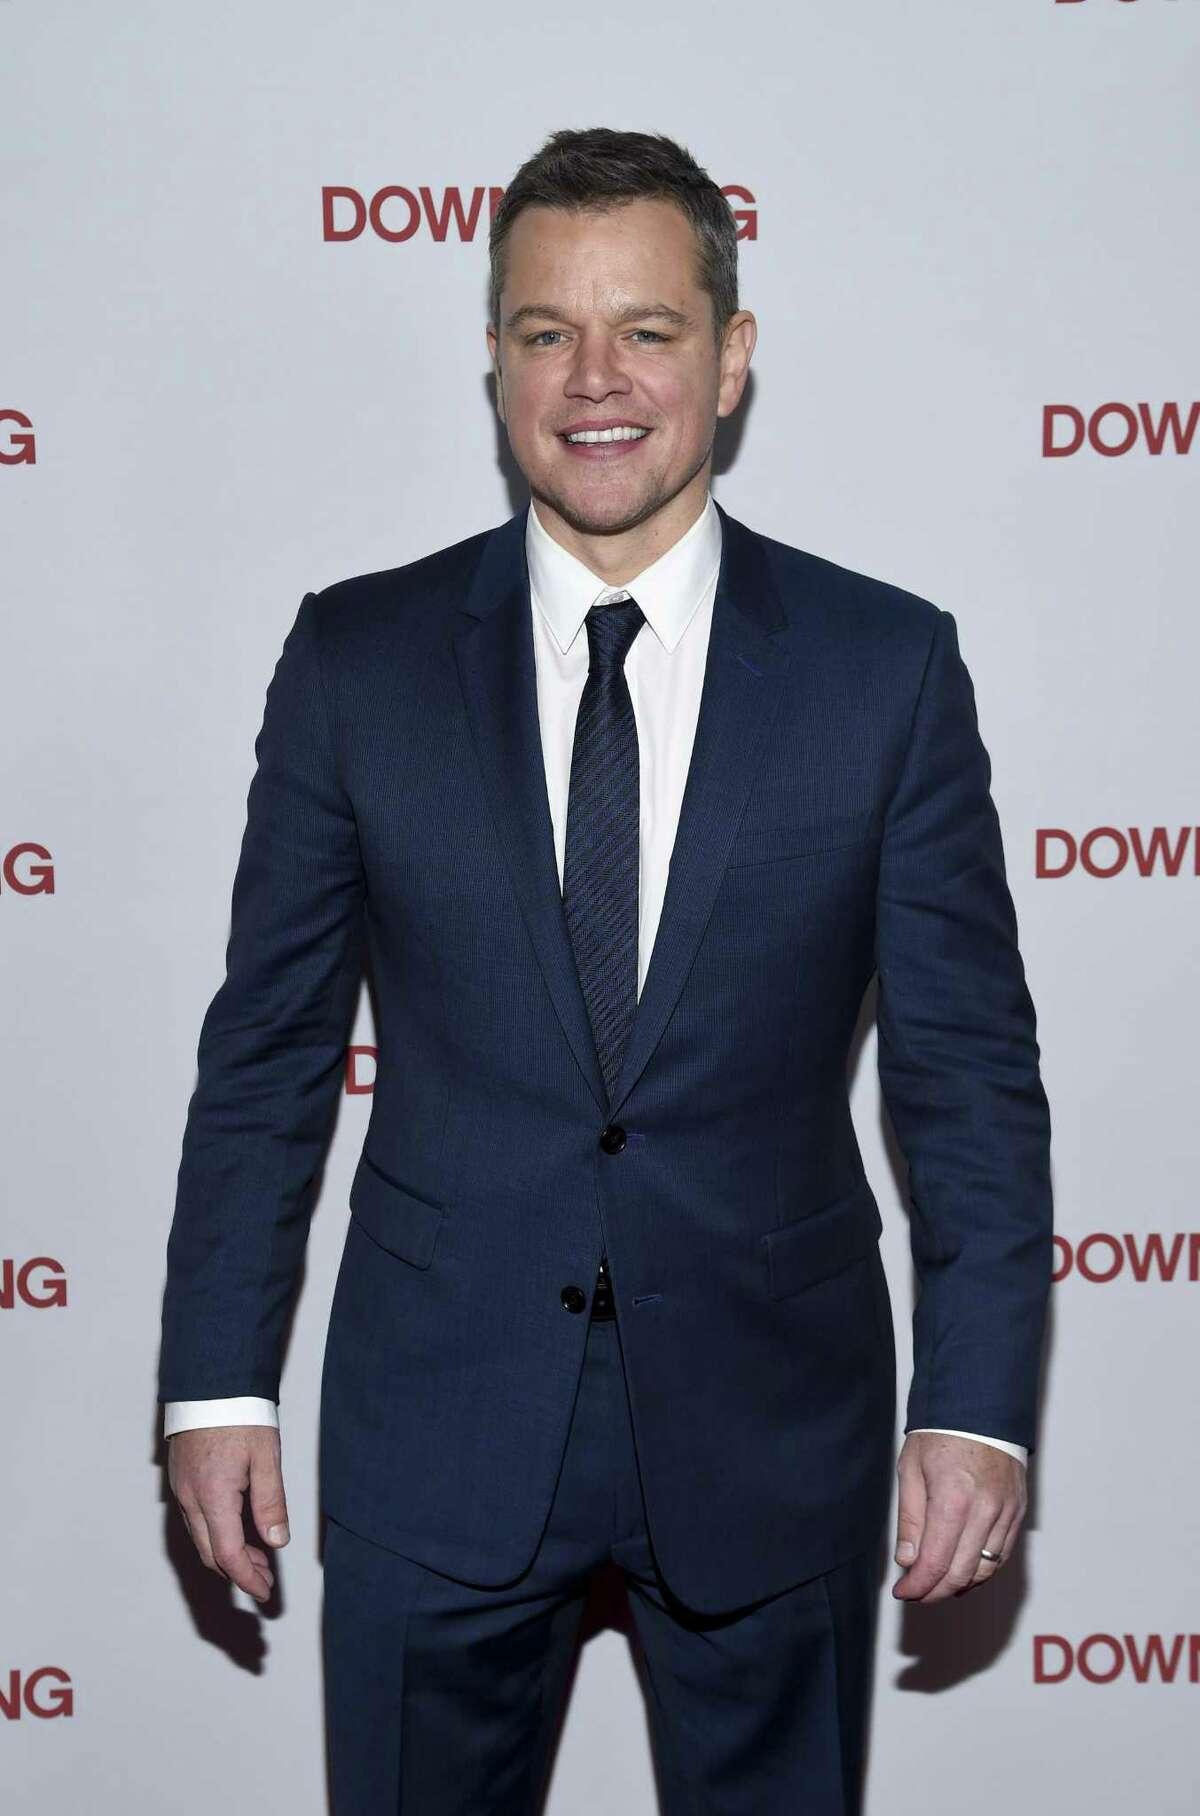 Actor Matt Damon, shown here at a special screening of